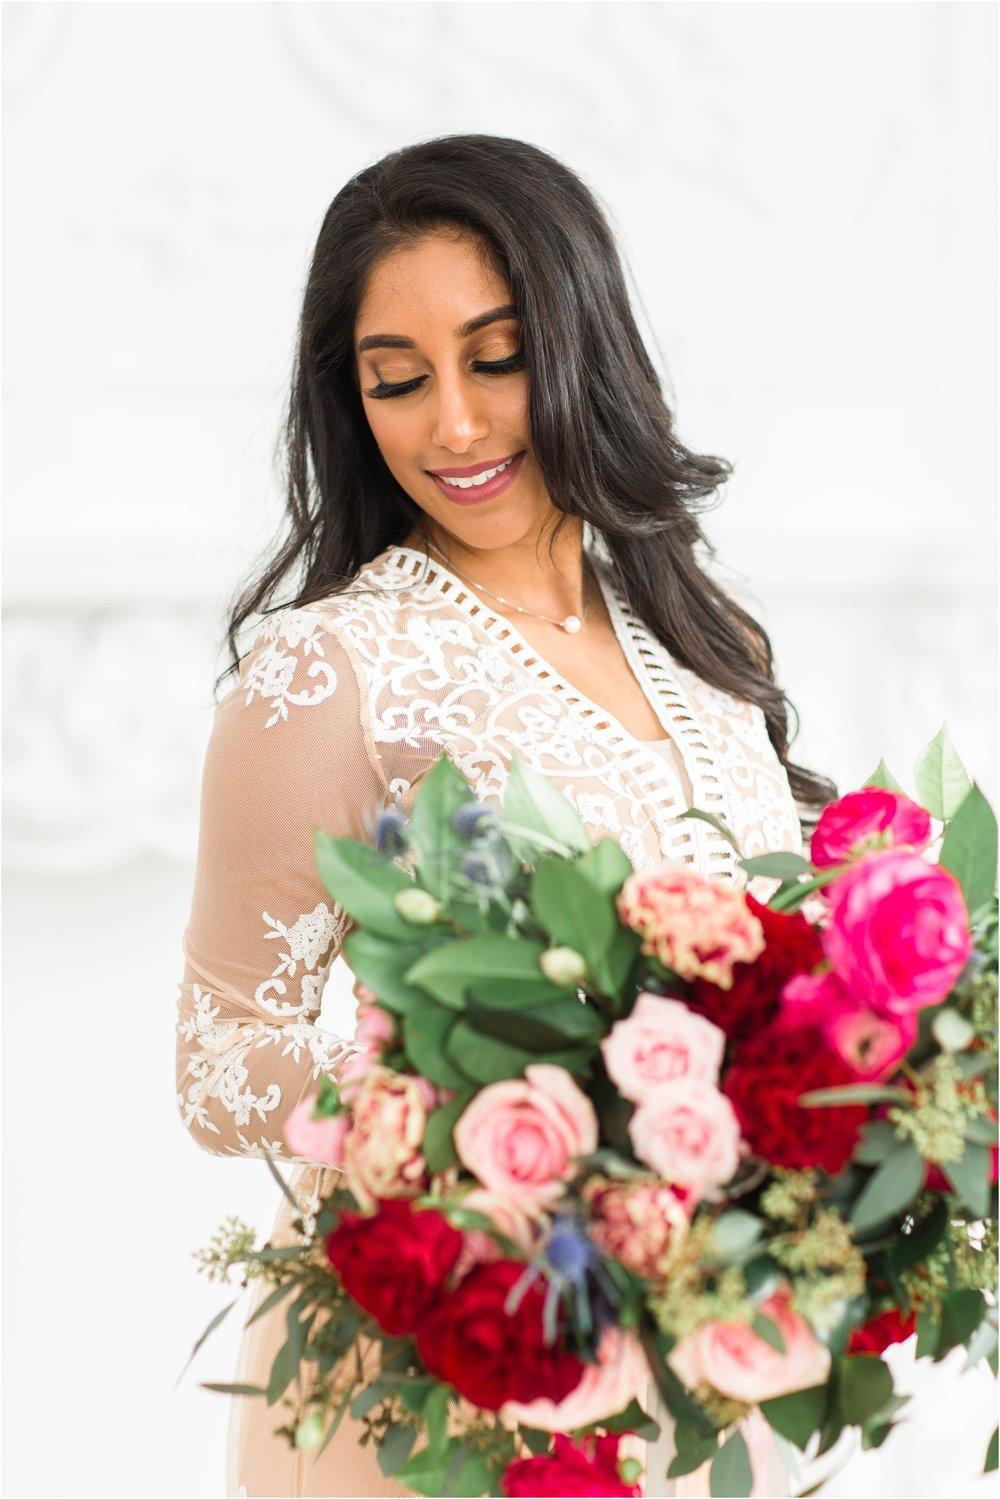 Mint-Room-Studios-Anniversary-Session-Toronto-Mississauga-Brampton-Scarborough-GTA-Pakistani-Indian-Wedding-Engagement-Photographer-Photography_0014.jpg